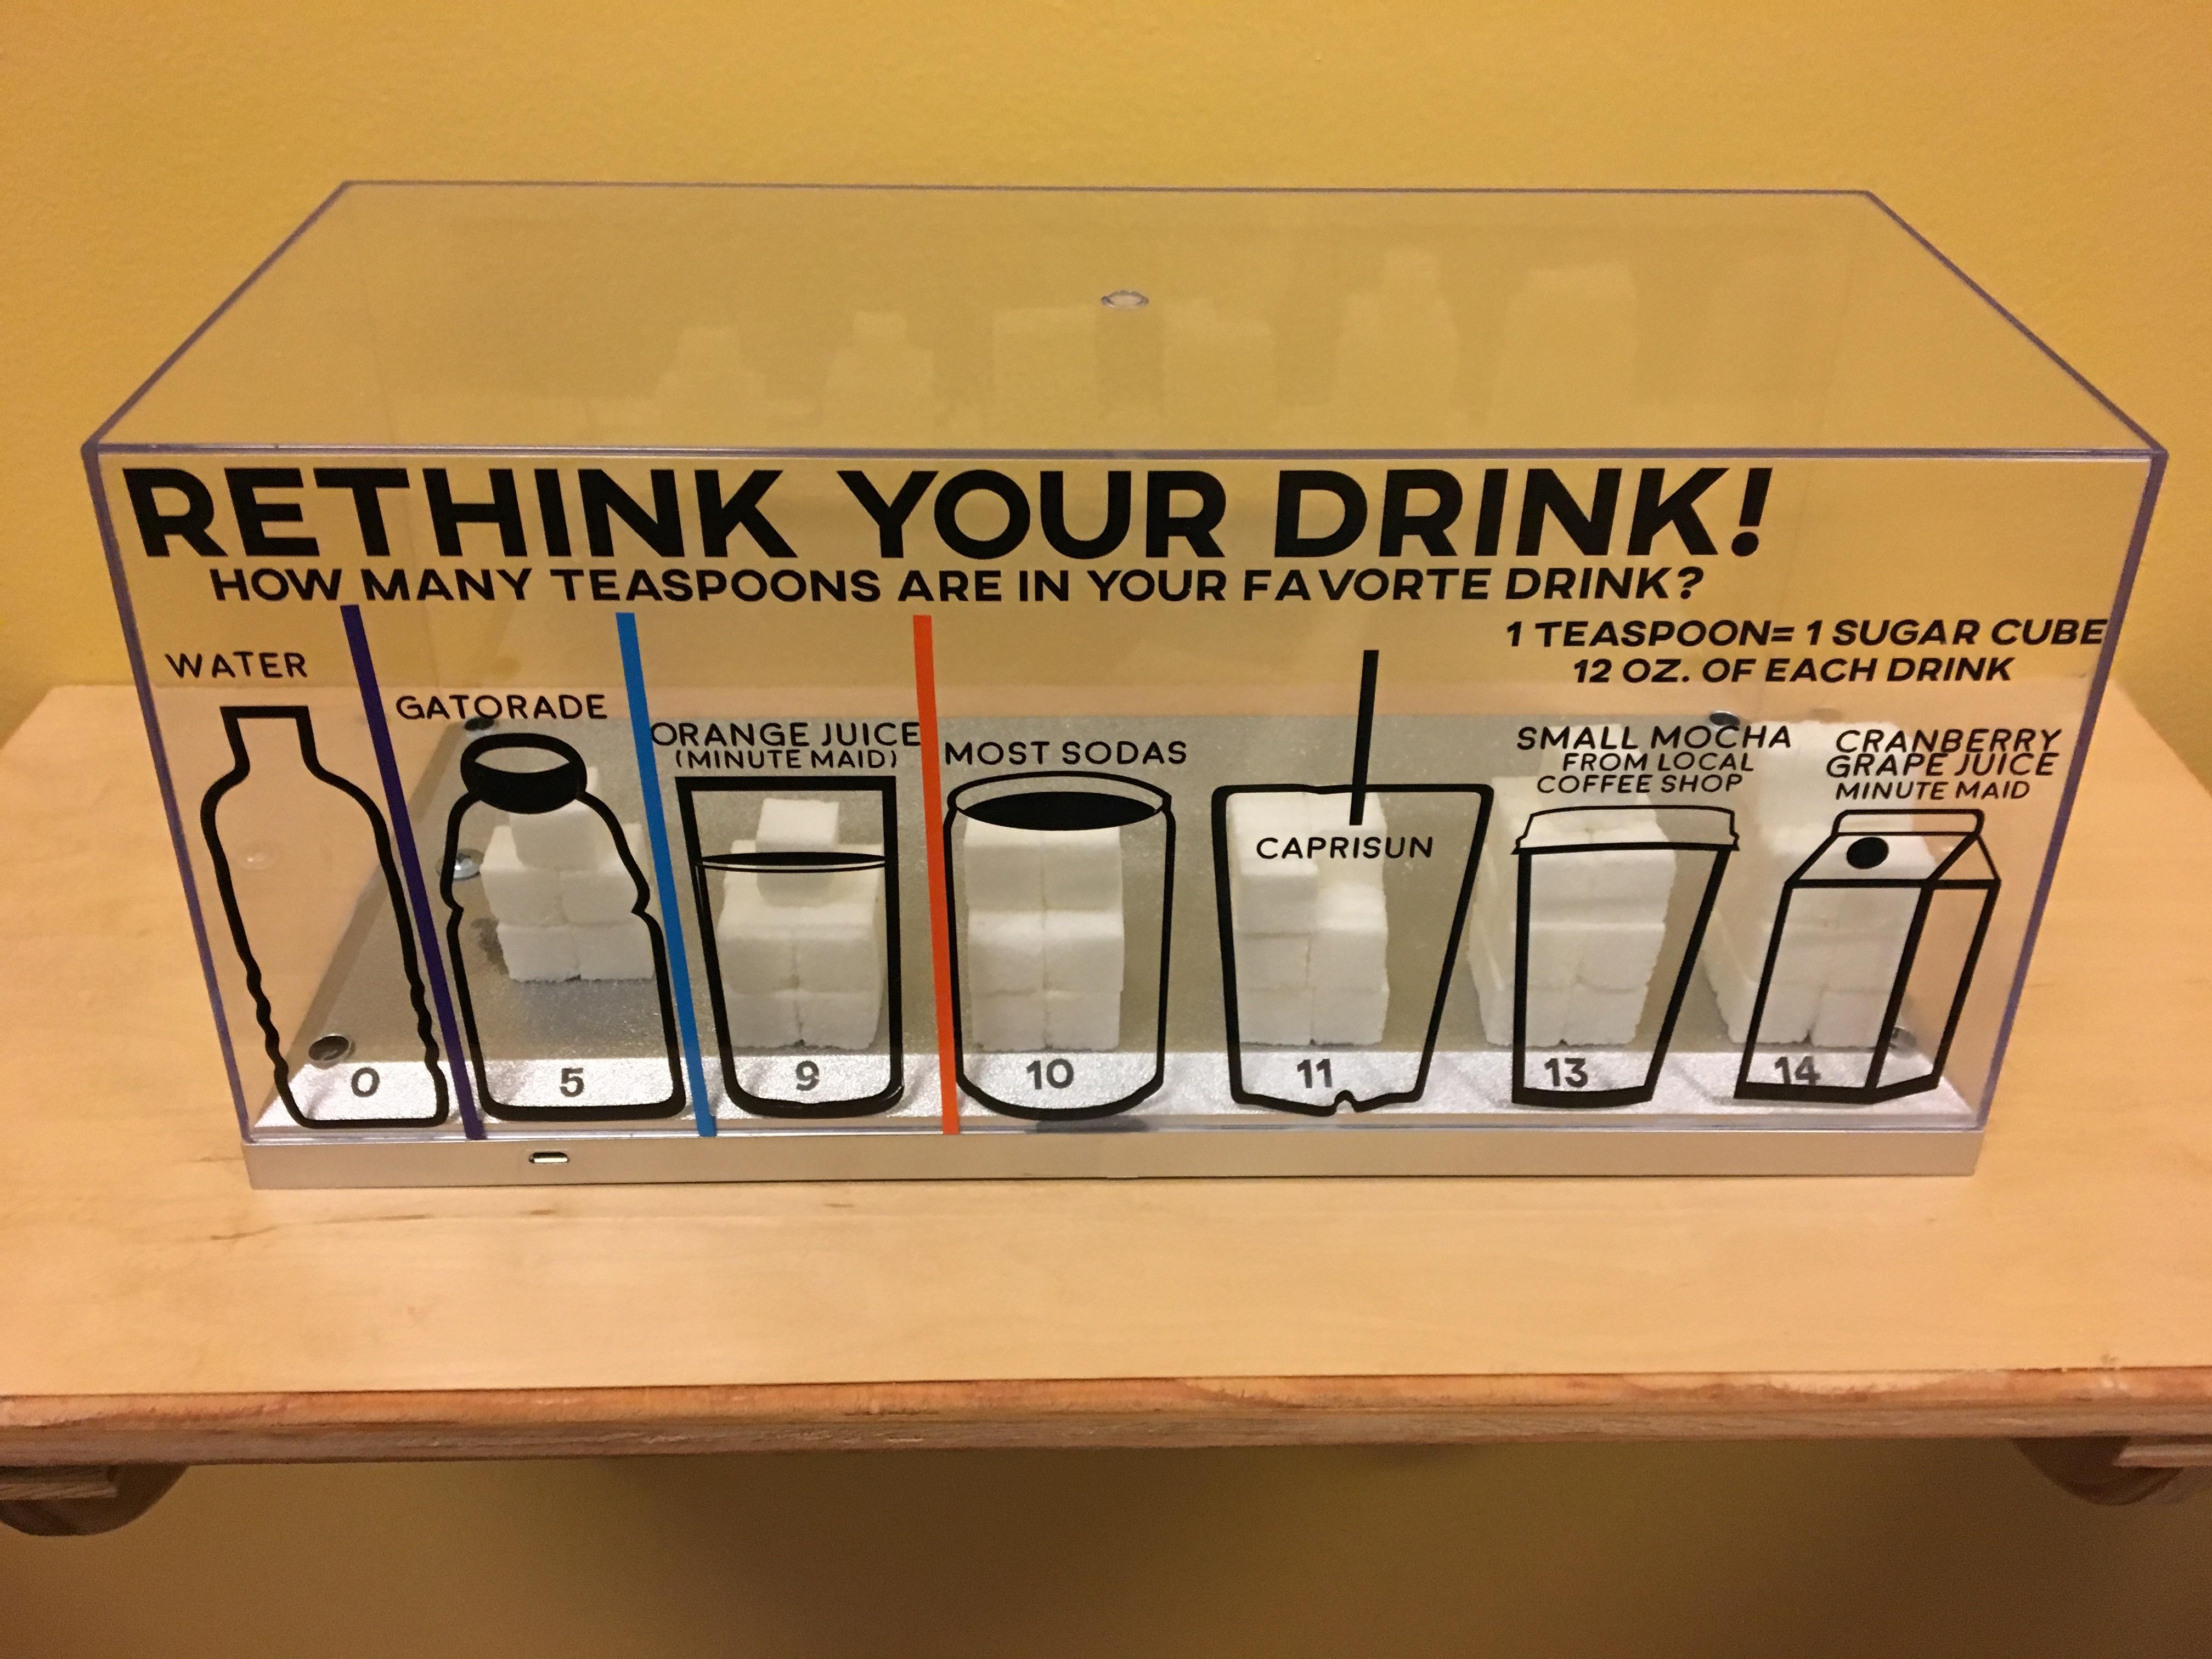 Rethink Your Drink & Sugar